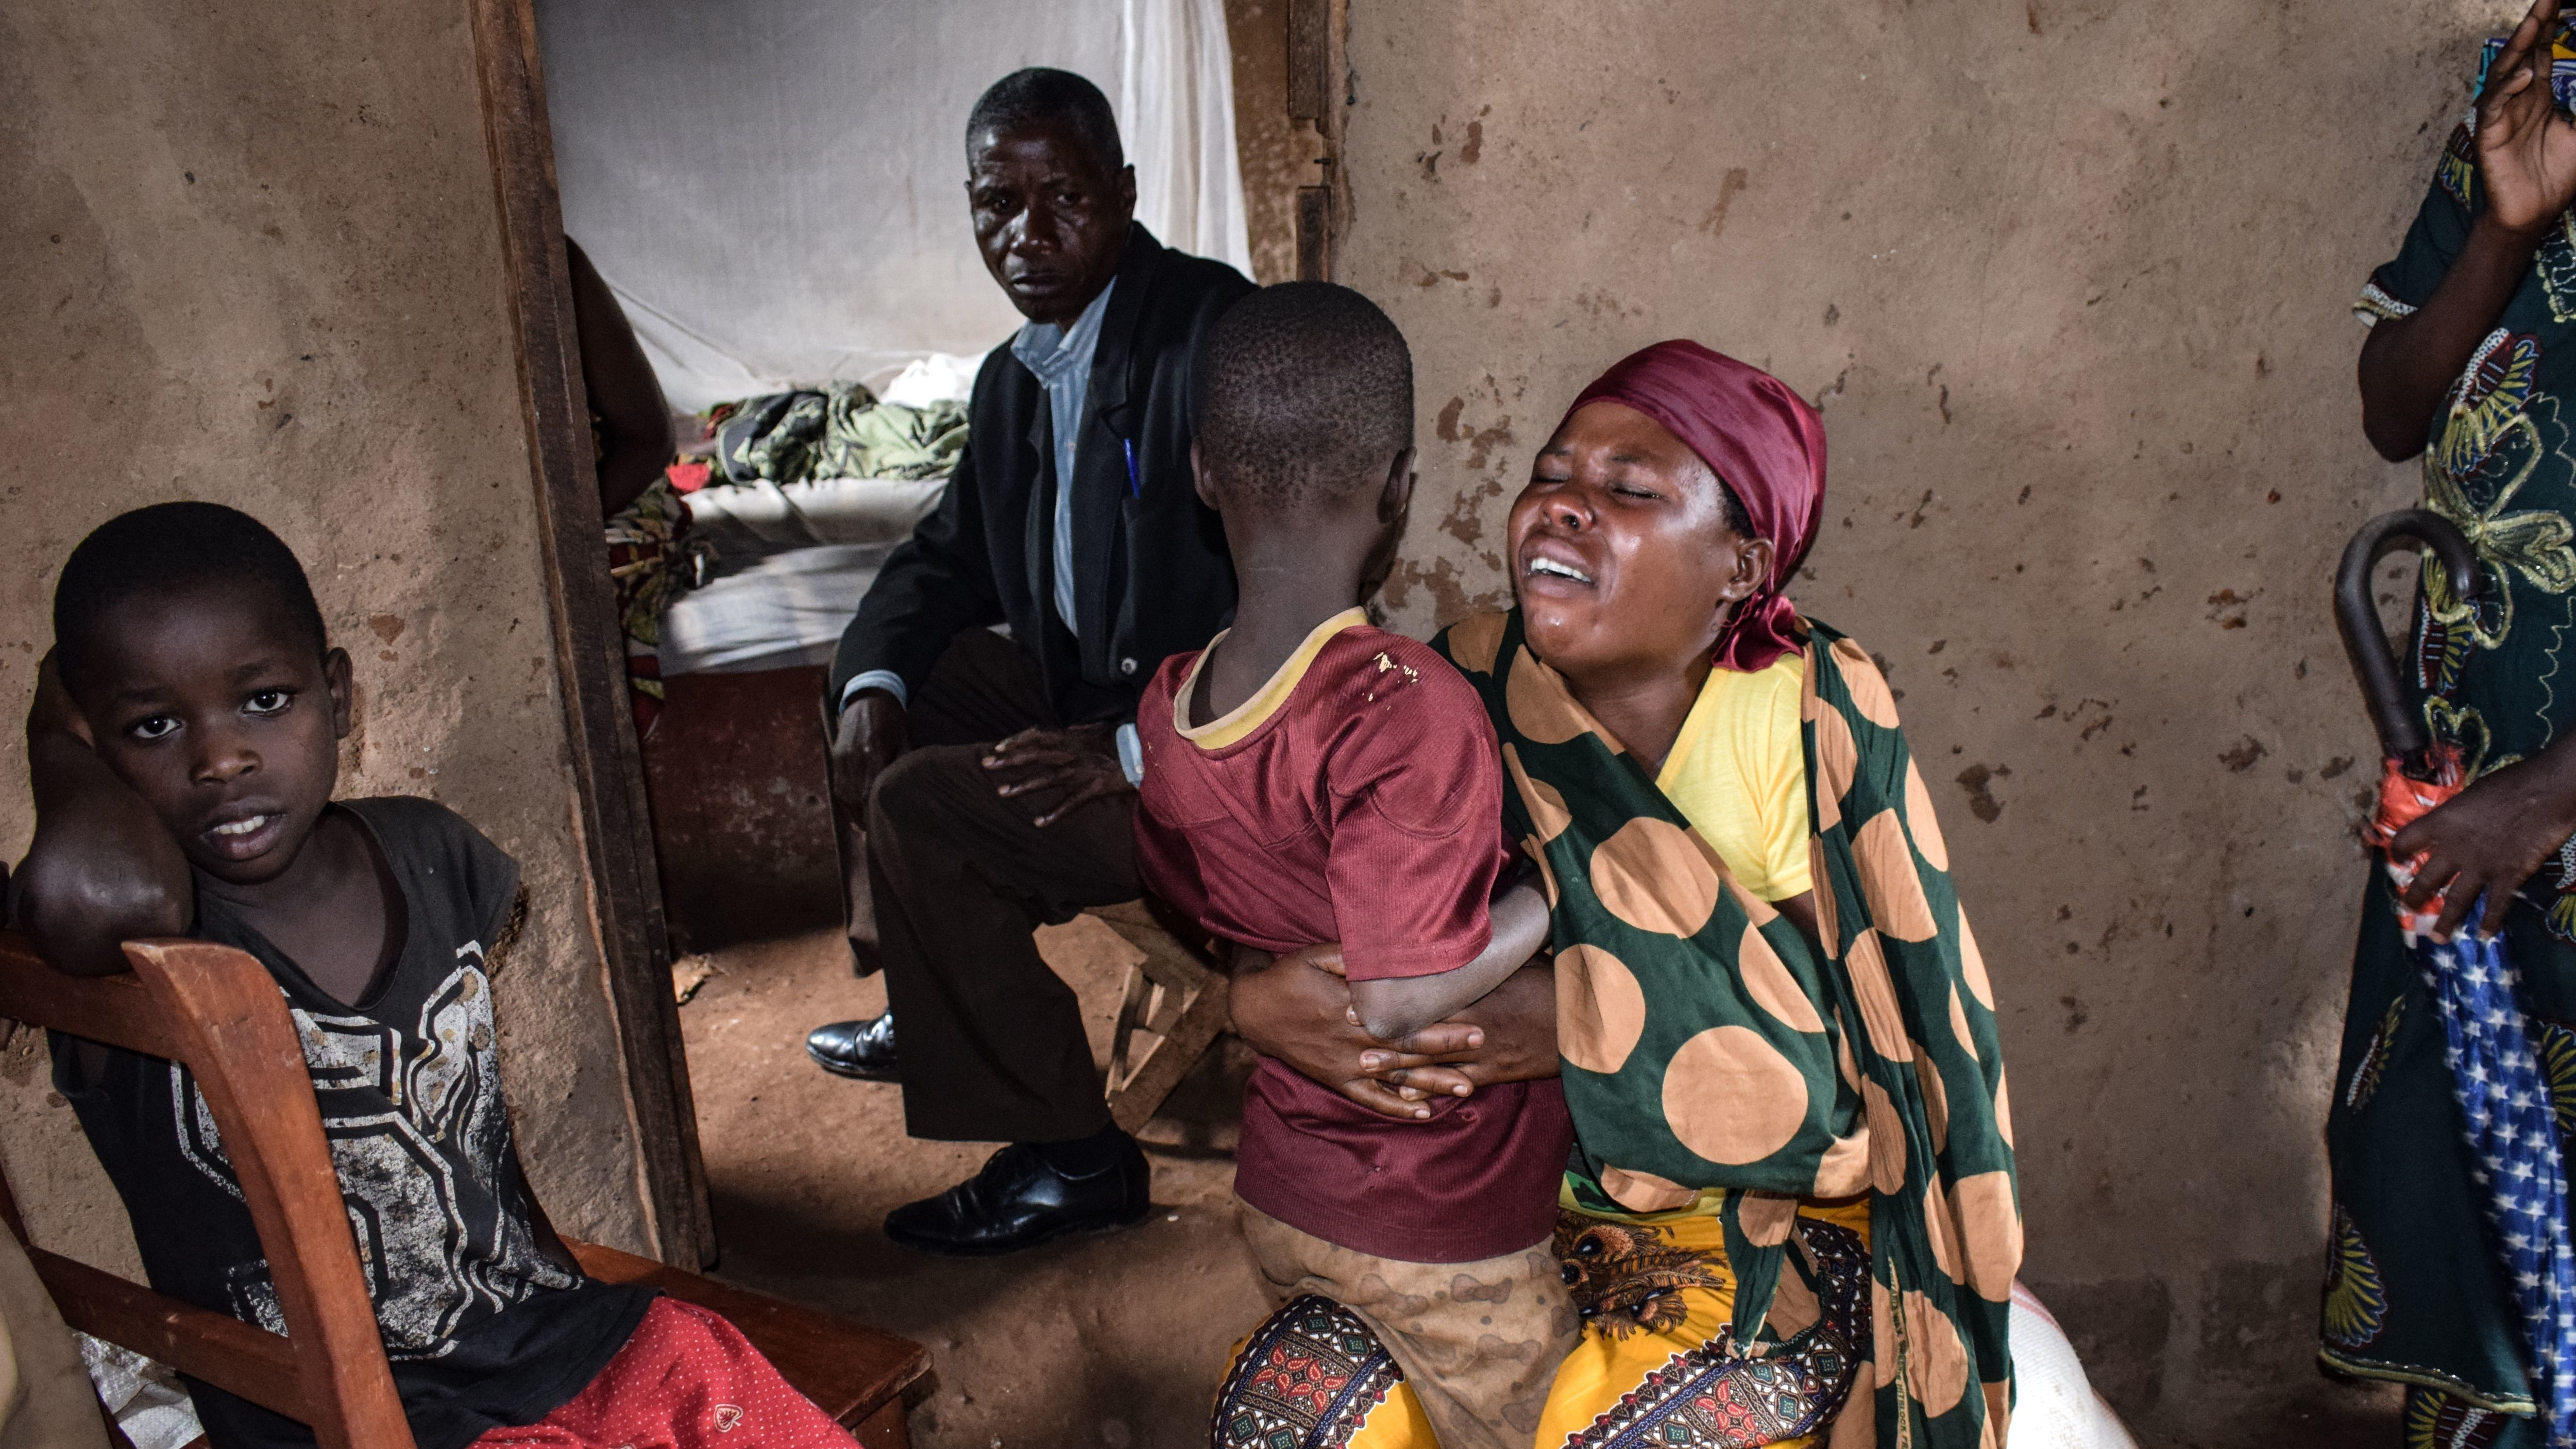 'Terrorist Group' Kills 26 In Burundi